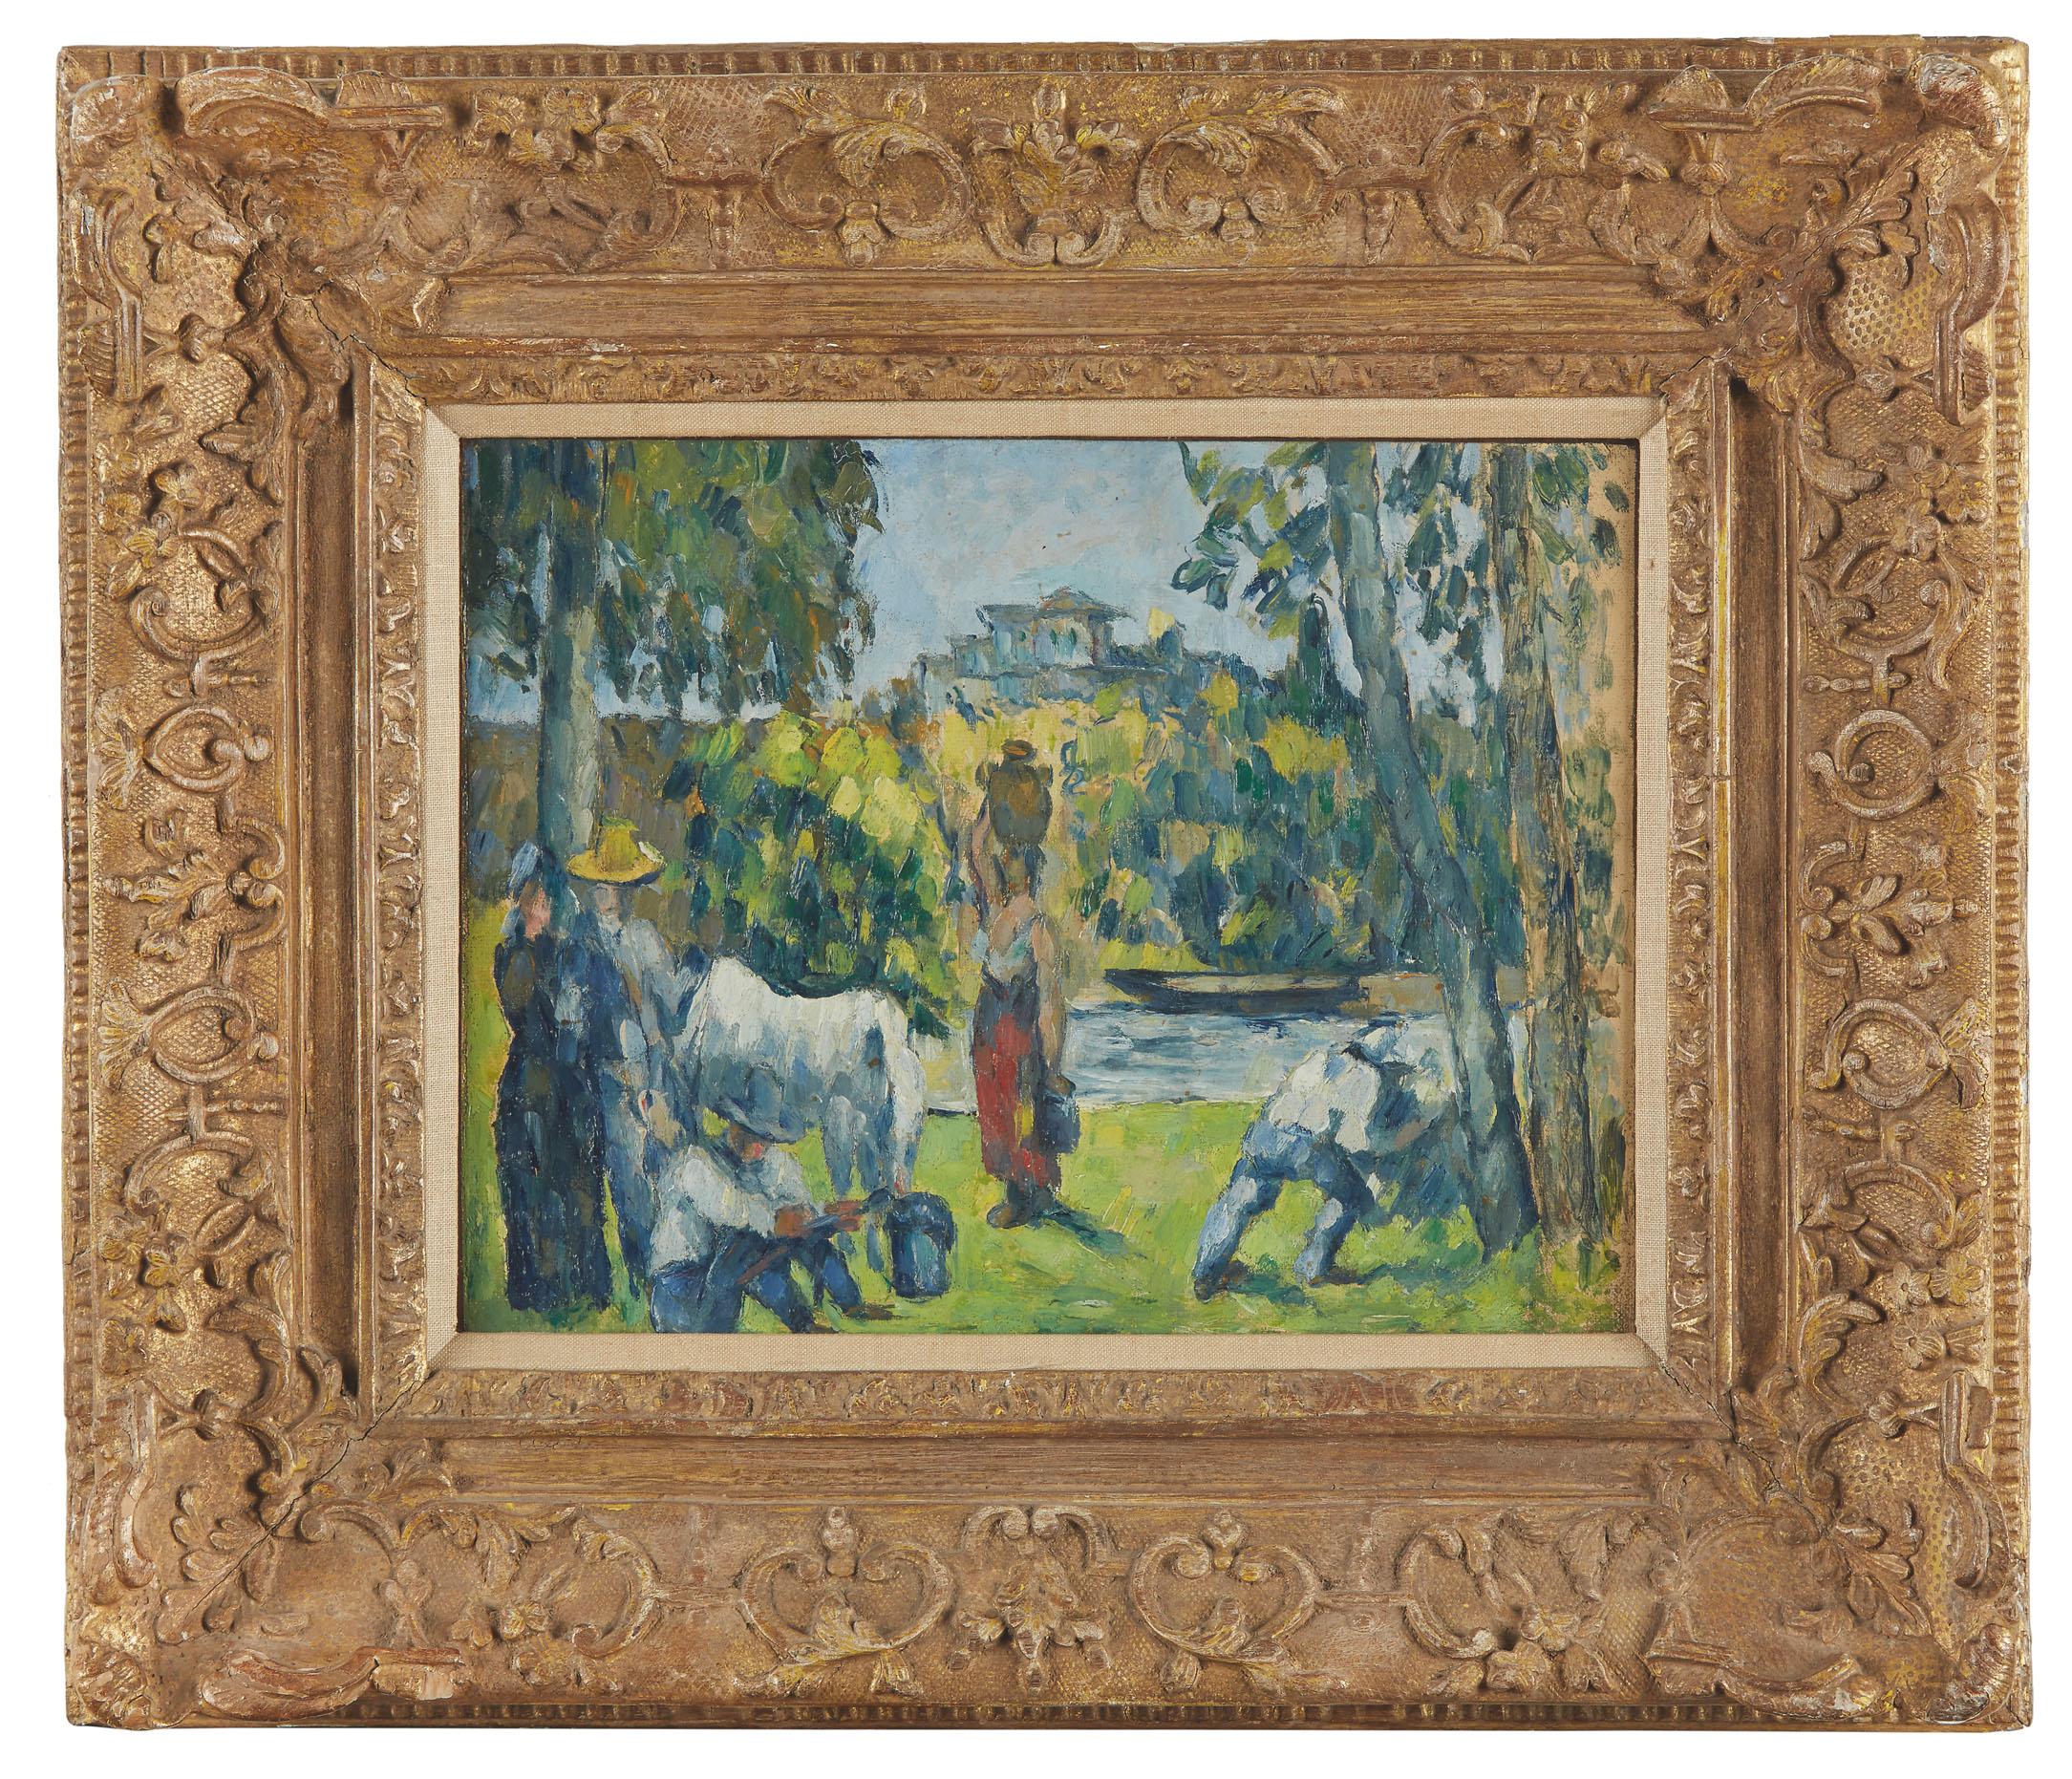 Part of Hamilton´s collection, Paul Cézanne's La Vie des Champs sold for 1,450,000 on Sunday (buyer´s premium included).